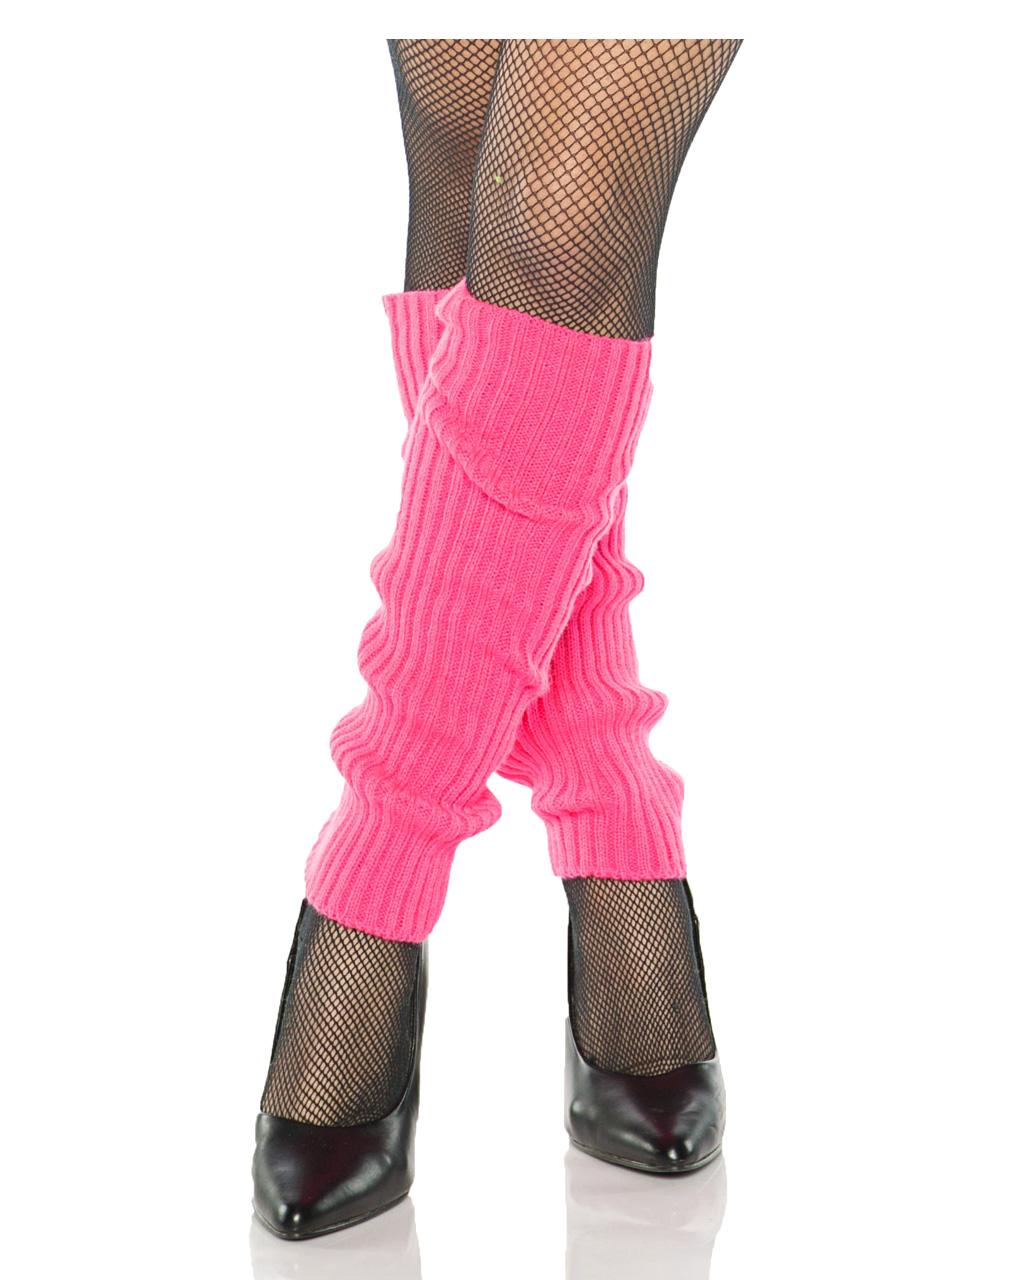 NEON 80s 1980s FANCY DRESS DANCE GYM HEN RIBBED LEGWARMERS BRIGHT FUSCHIA PINK